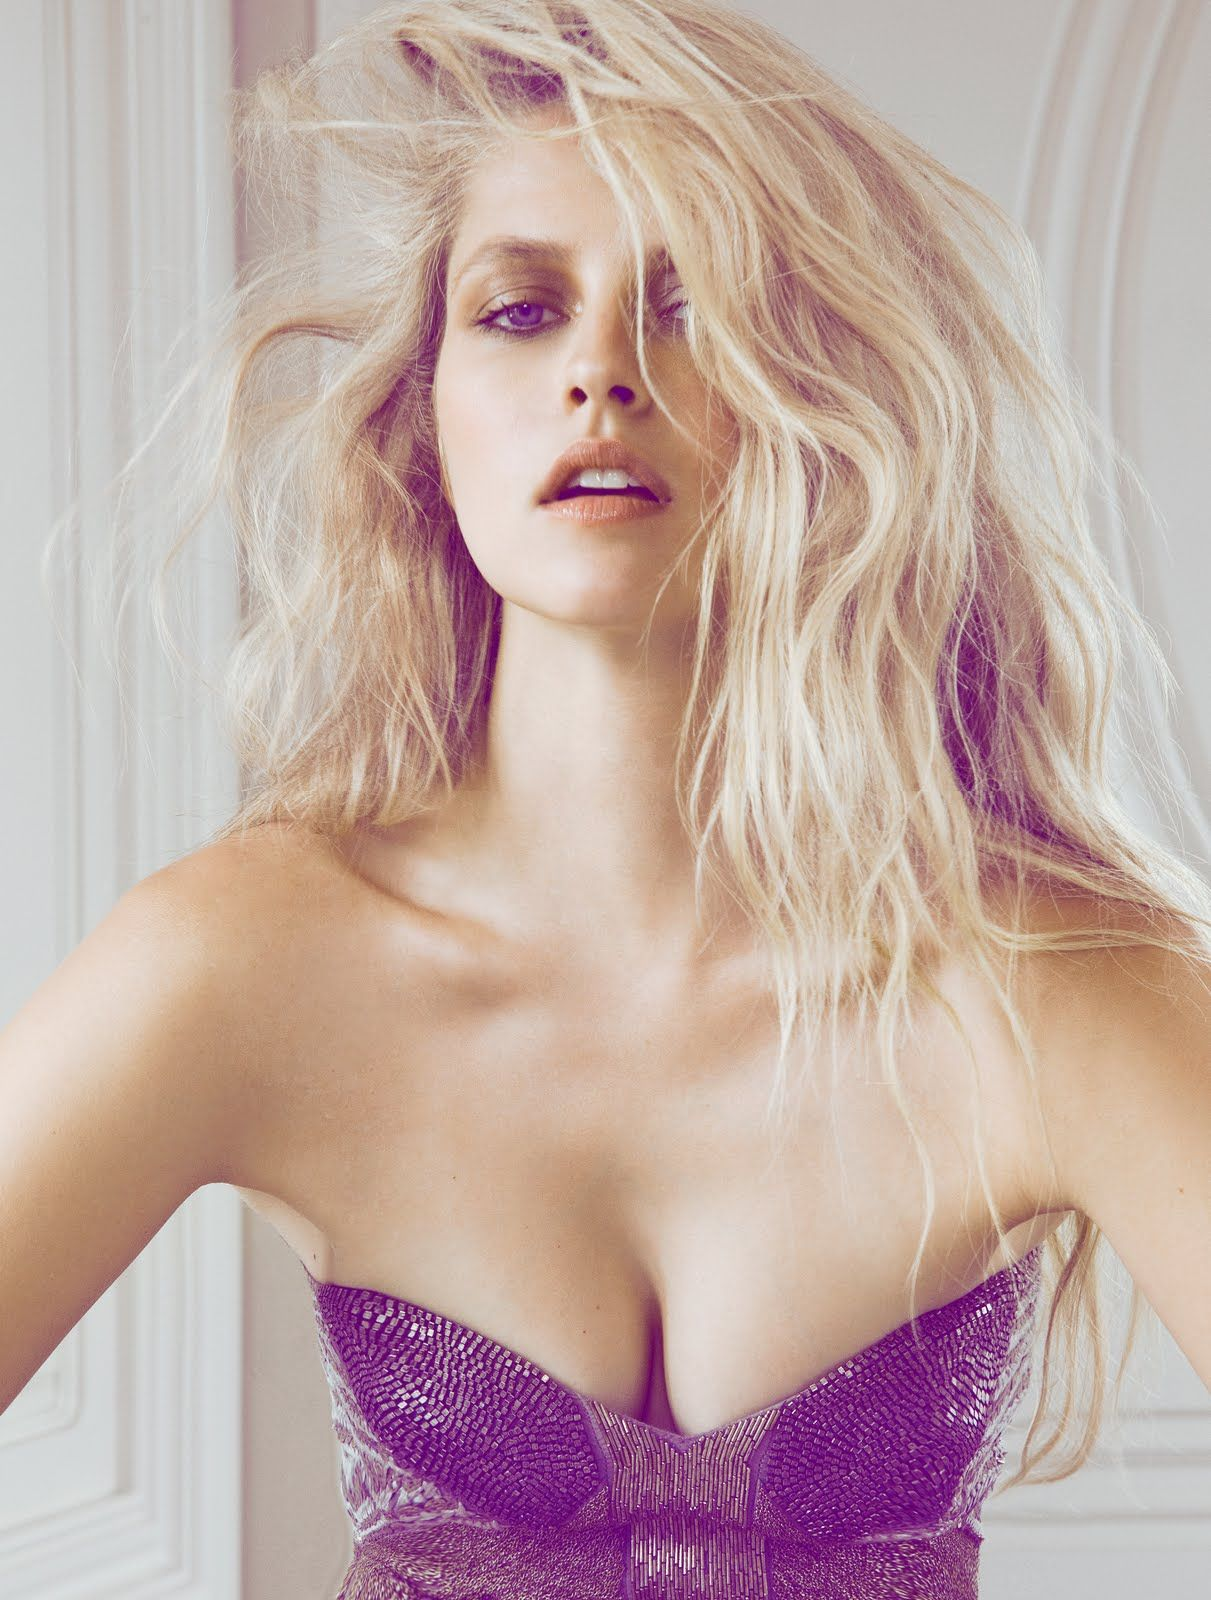 Teresa palmer new sexy photos - 2019 year